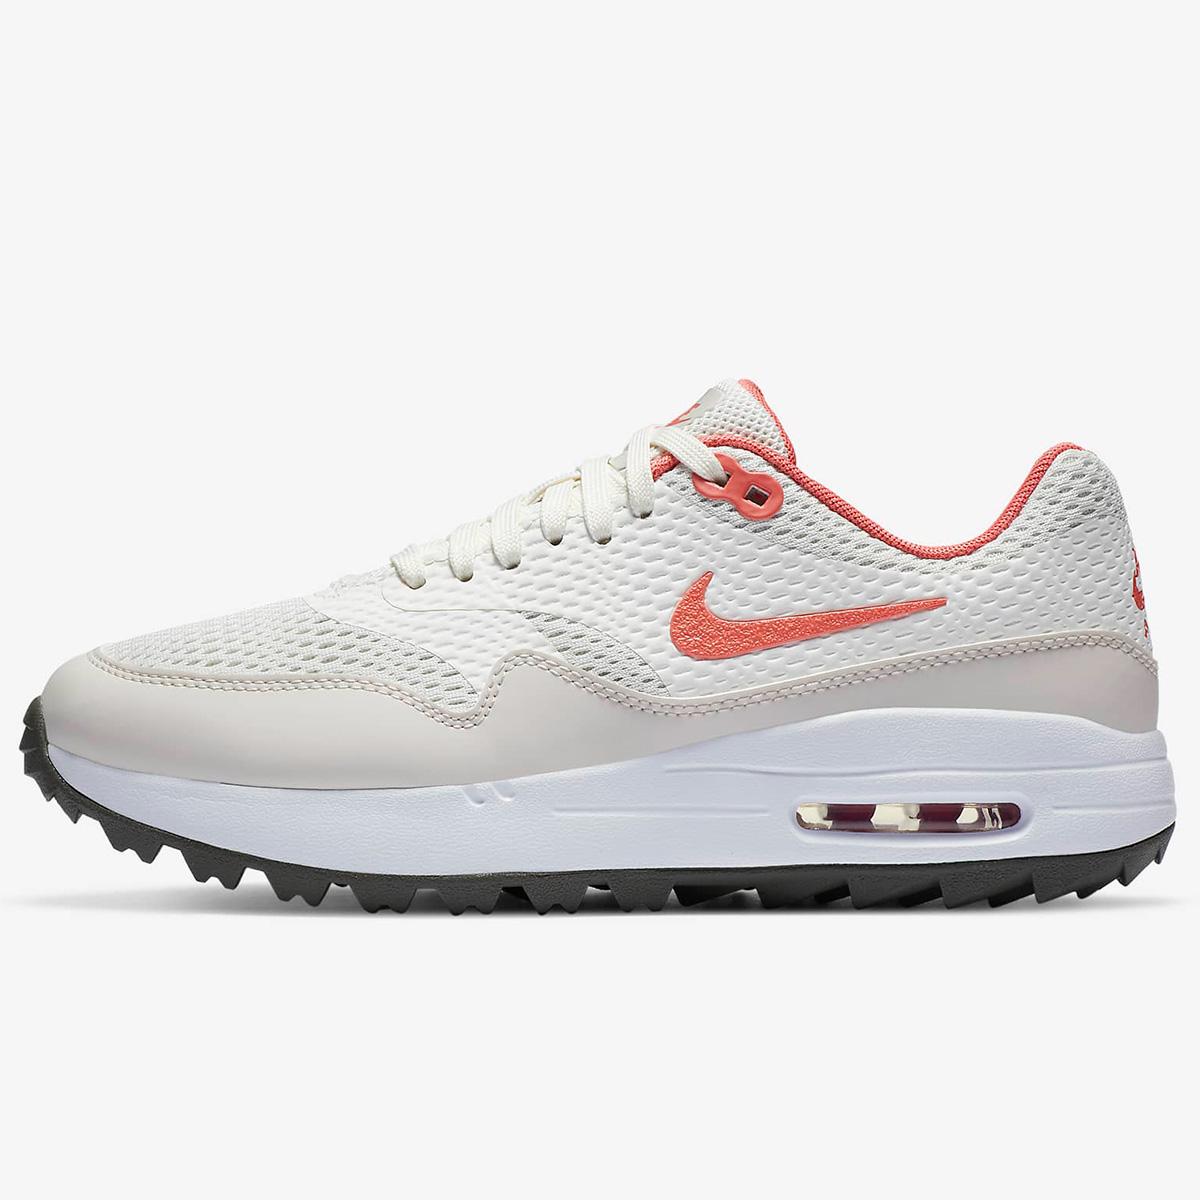 Nike Golf Ladies Air Max 1G Shoes 2020 | Online Golf